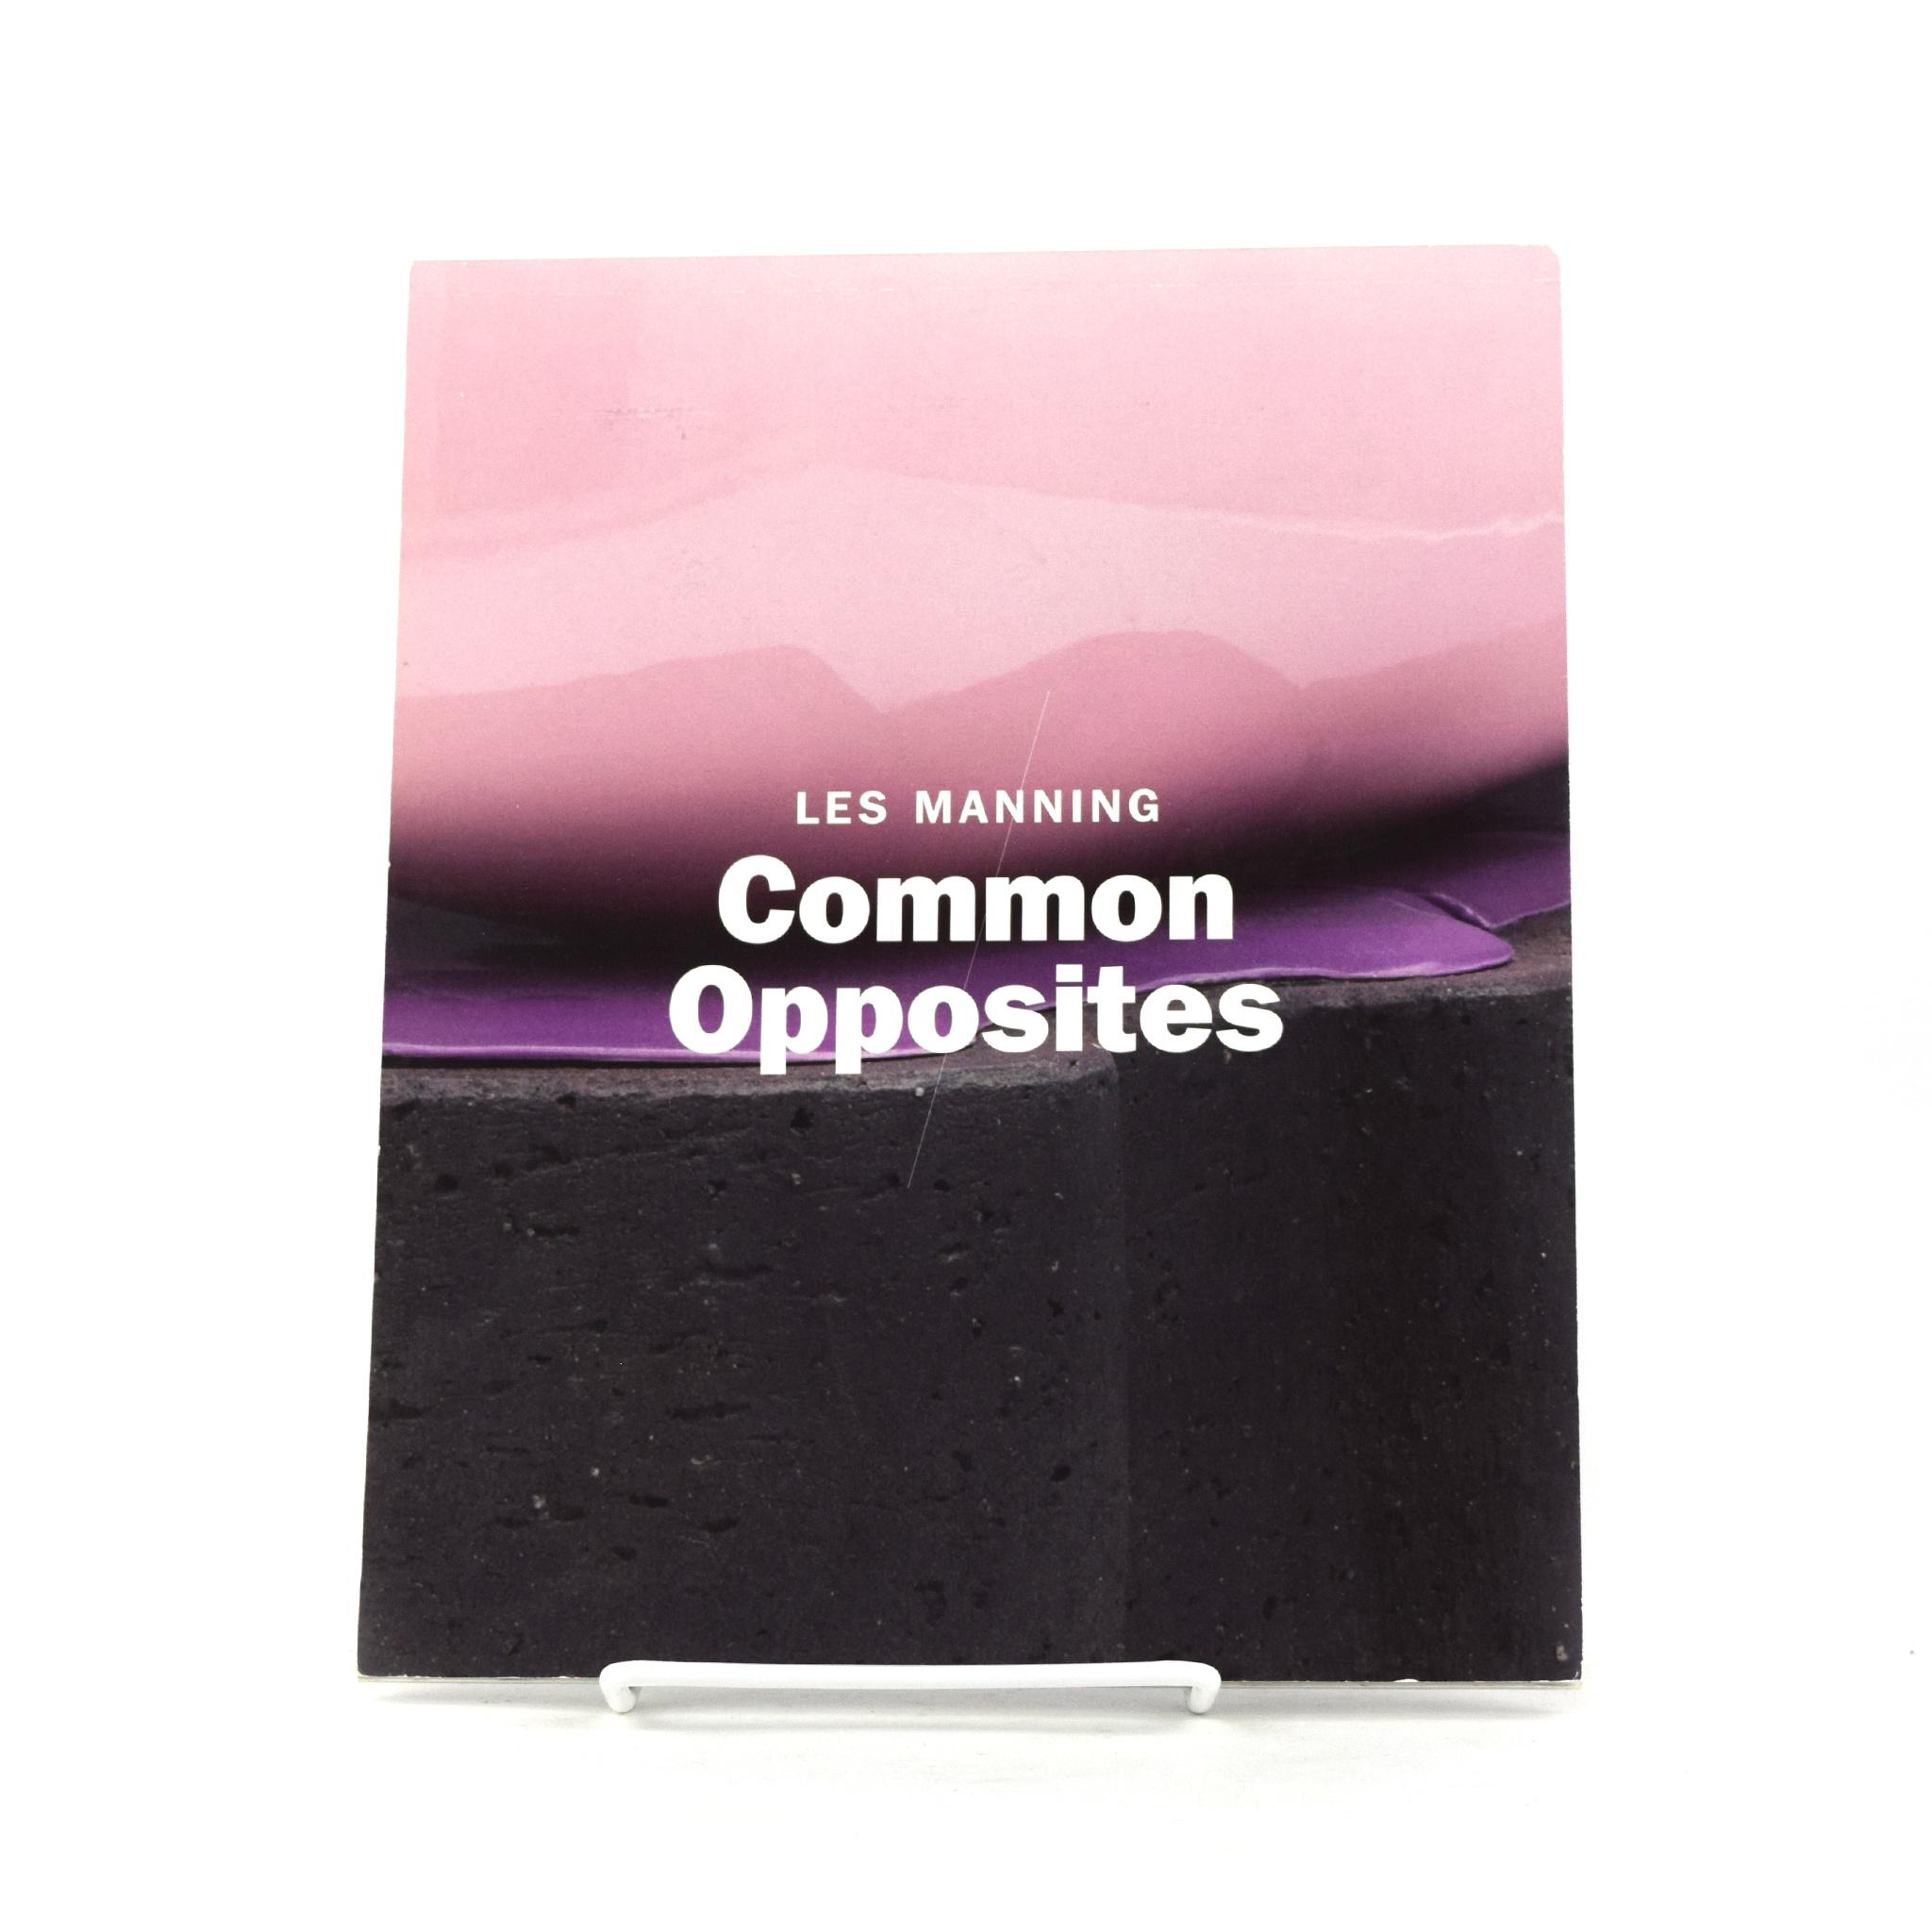 Les Manning's Common/Opposites